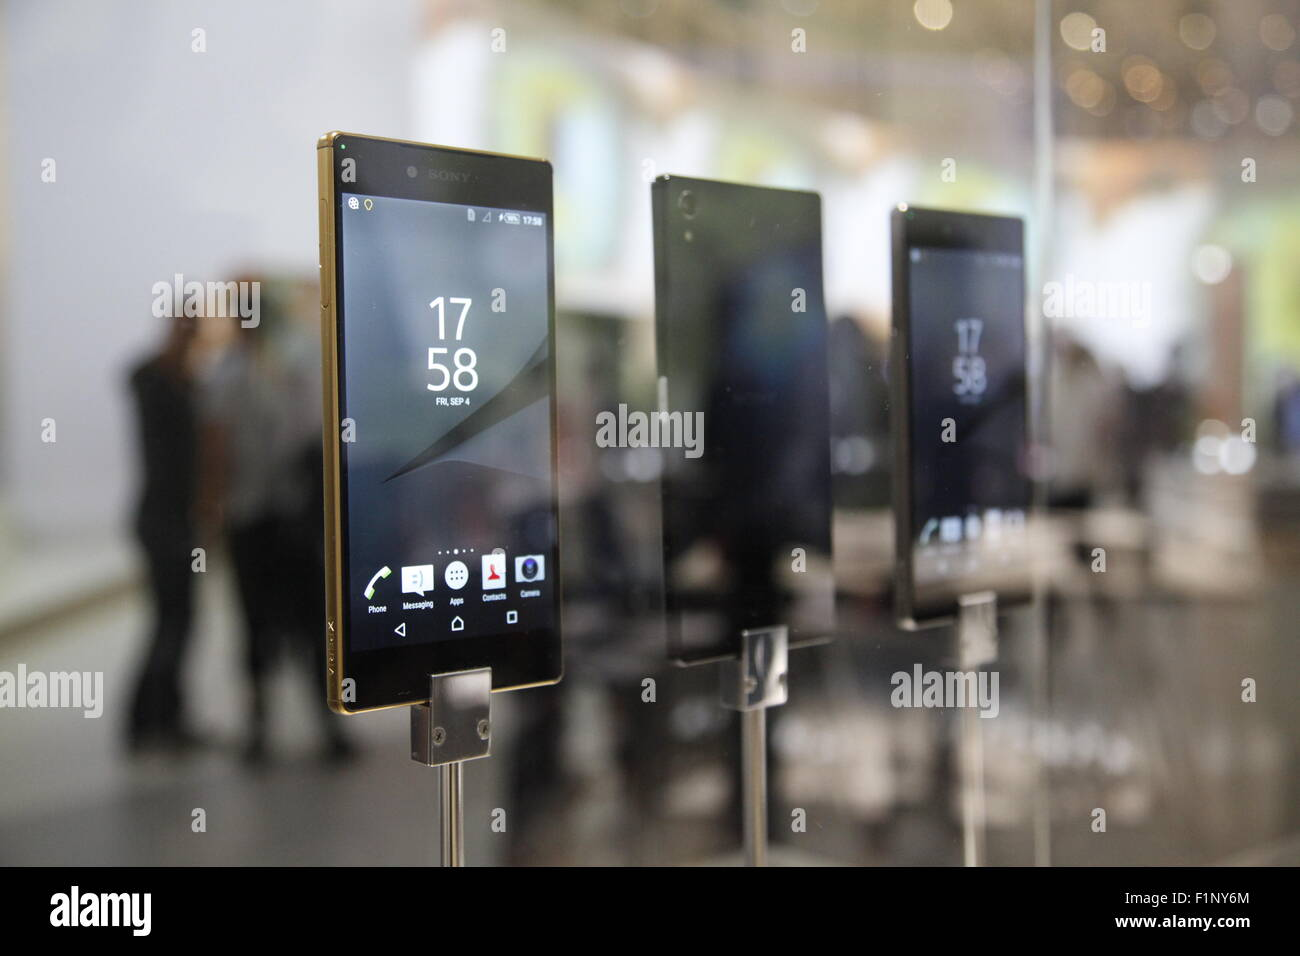 Berlin, Germany. 4th September, 2015. IFA 2015, Sony Smartphone Xperia Z5 Premium mit 4K Credit:  Stefan Papp/Alamy - Stock Image